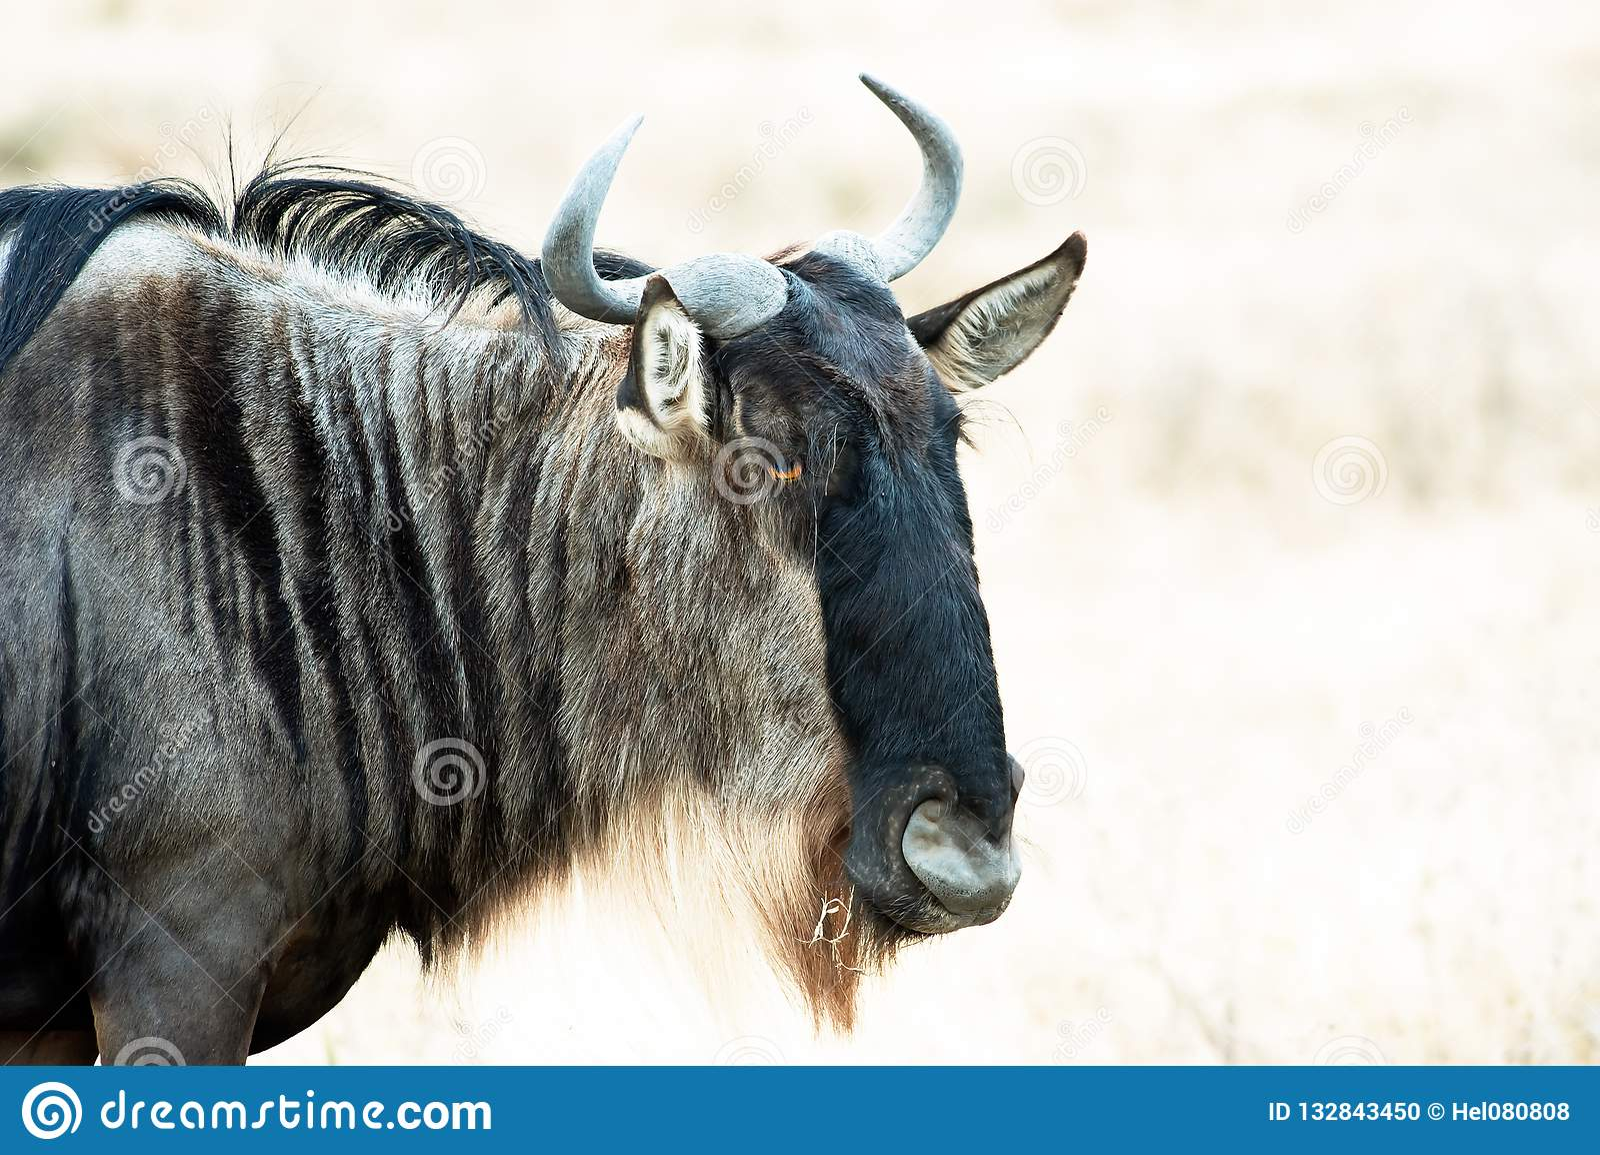 Wildebeest Head, closeup of wildebeest in savannah of Serengeti, Tanzania